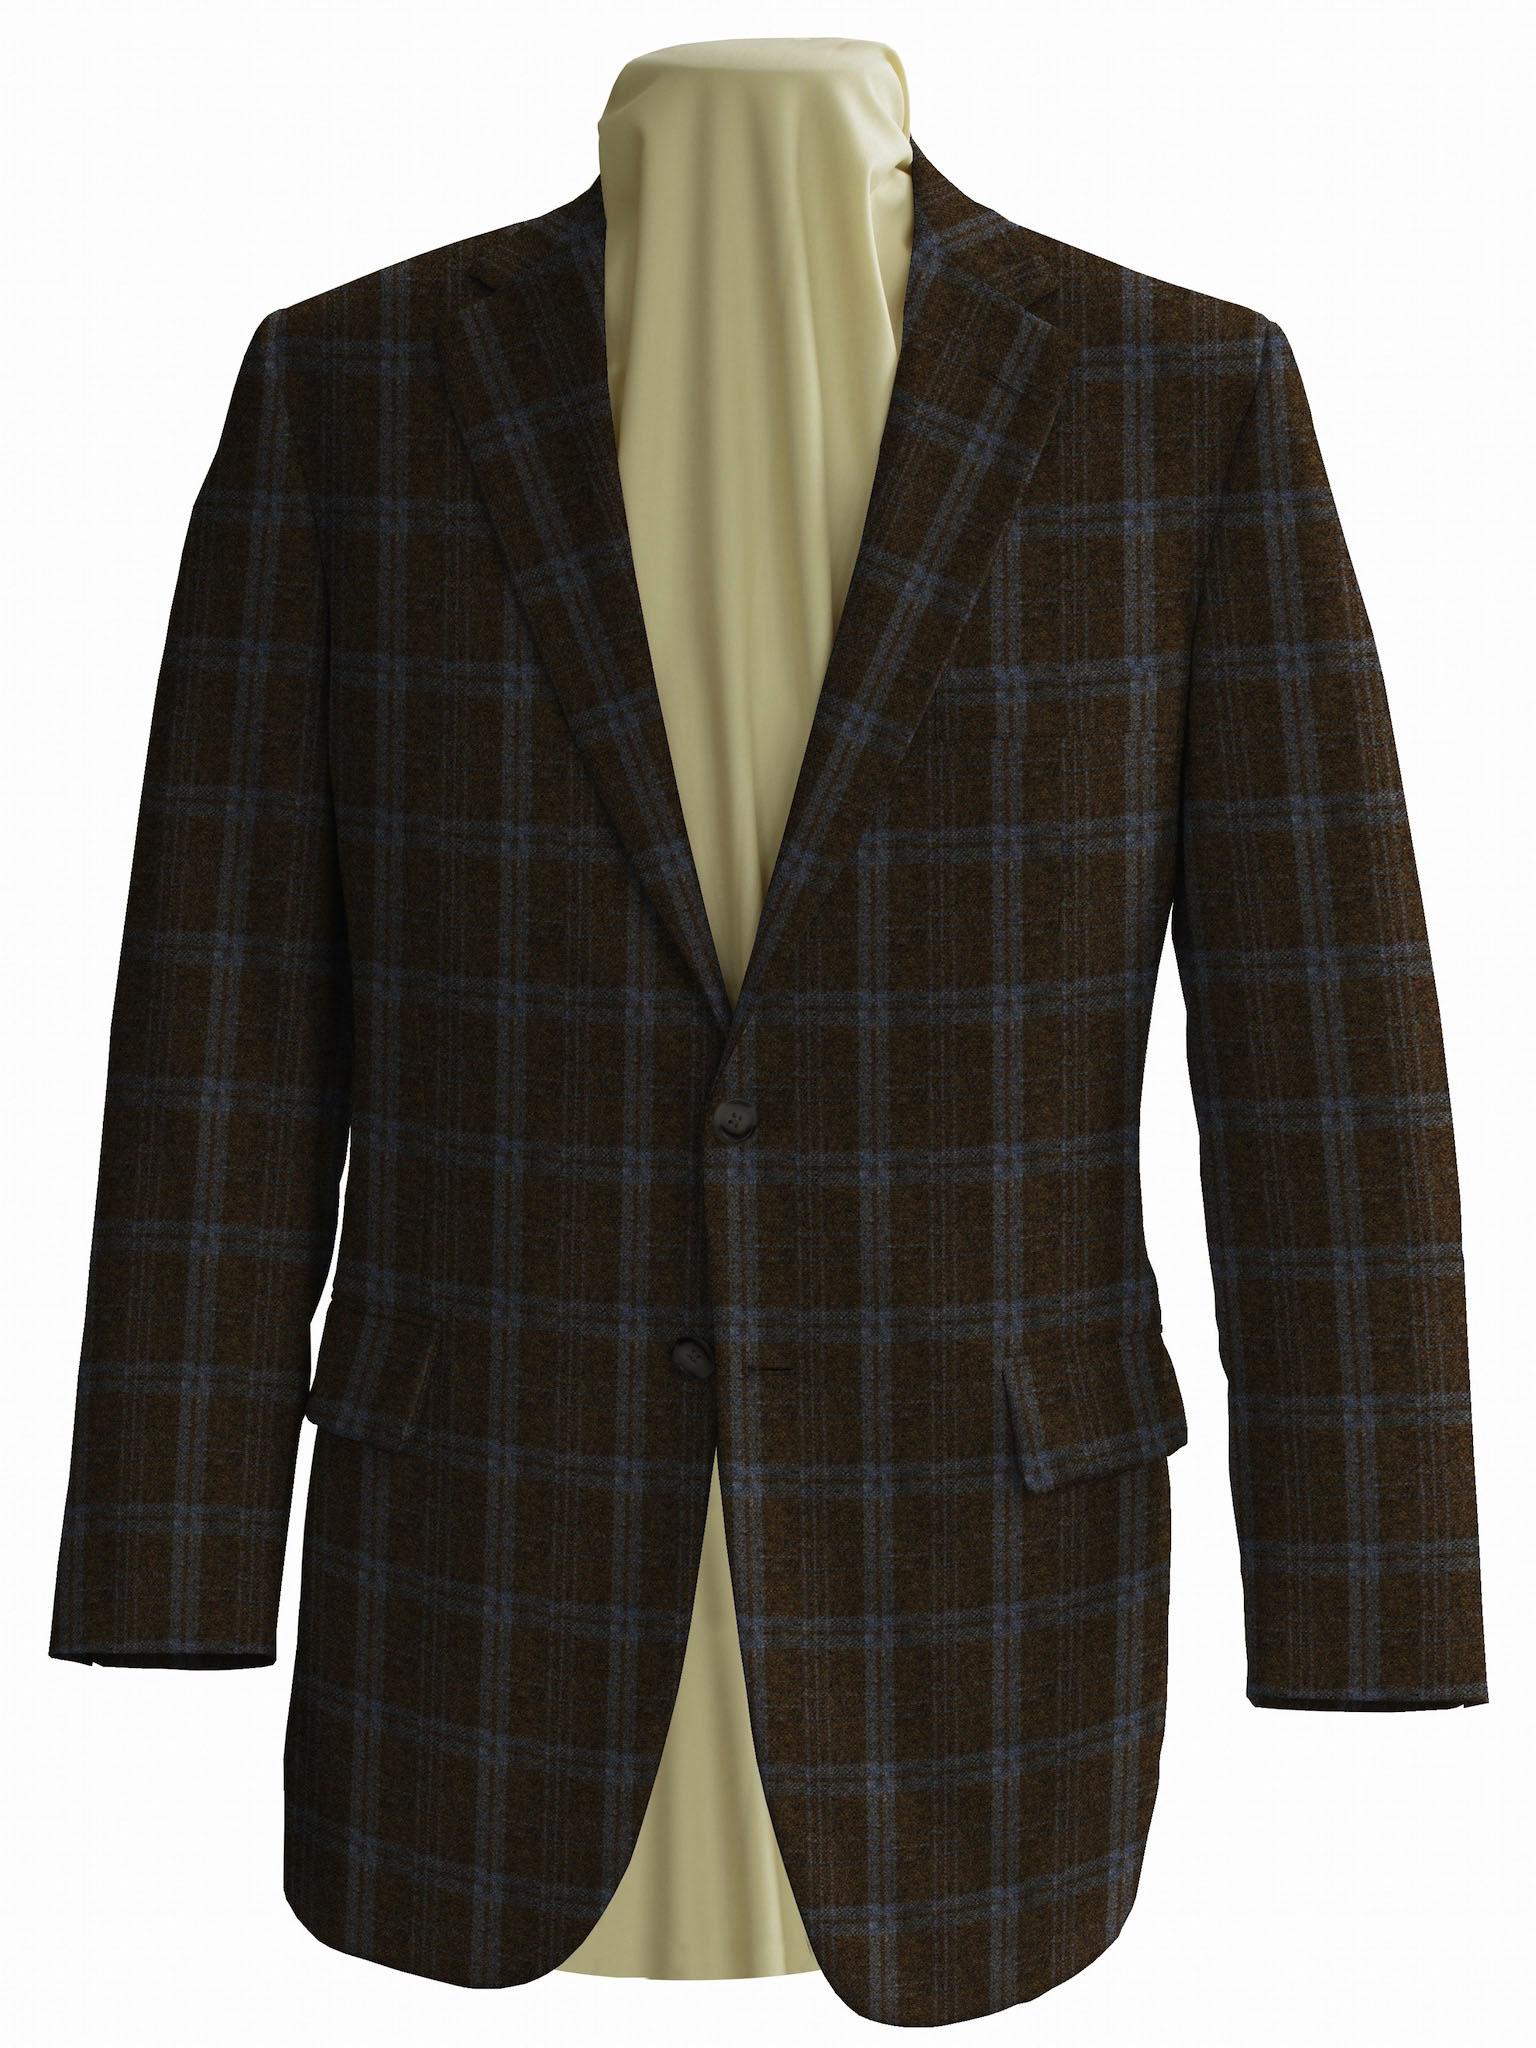 Sherry Kash Jackets Ltd Edition 904013